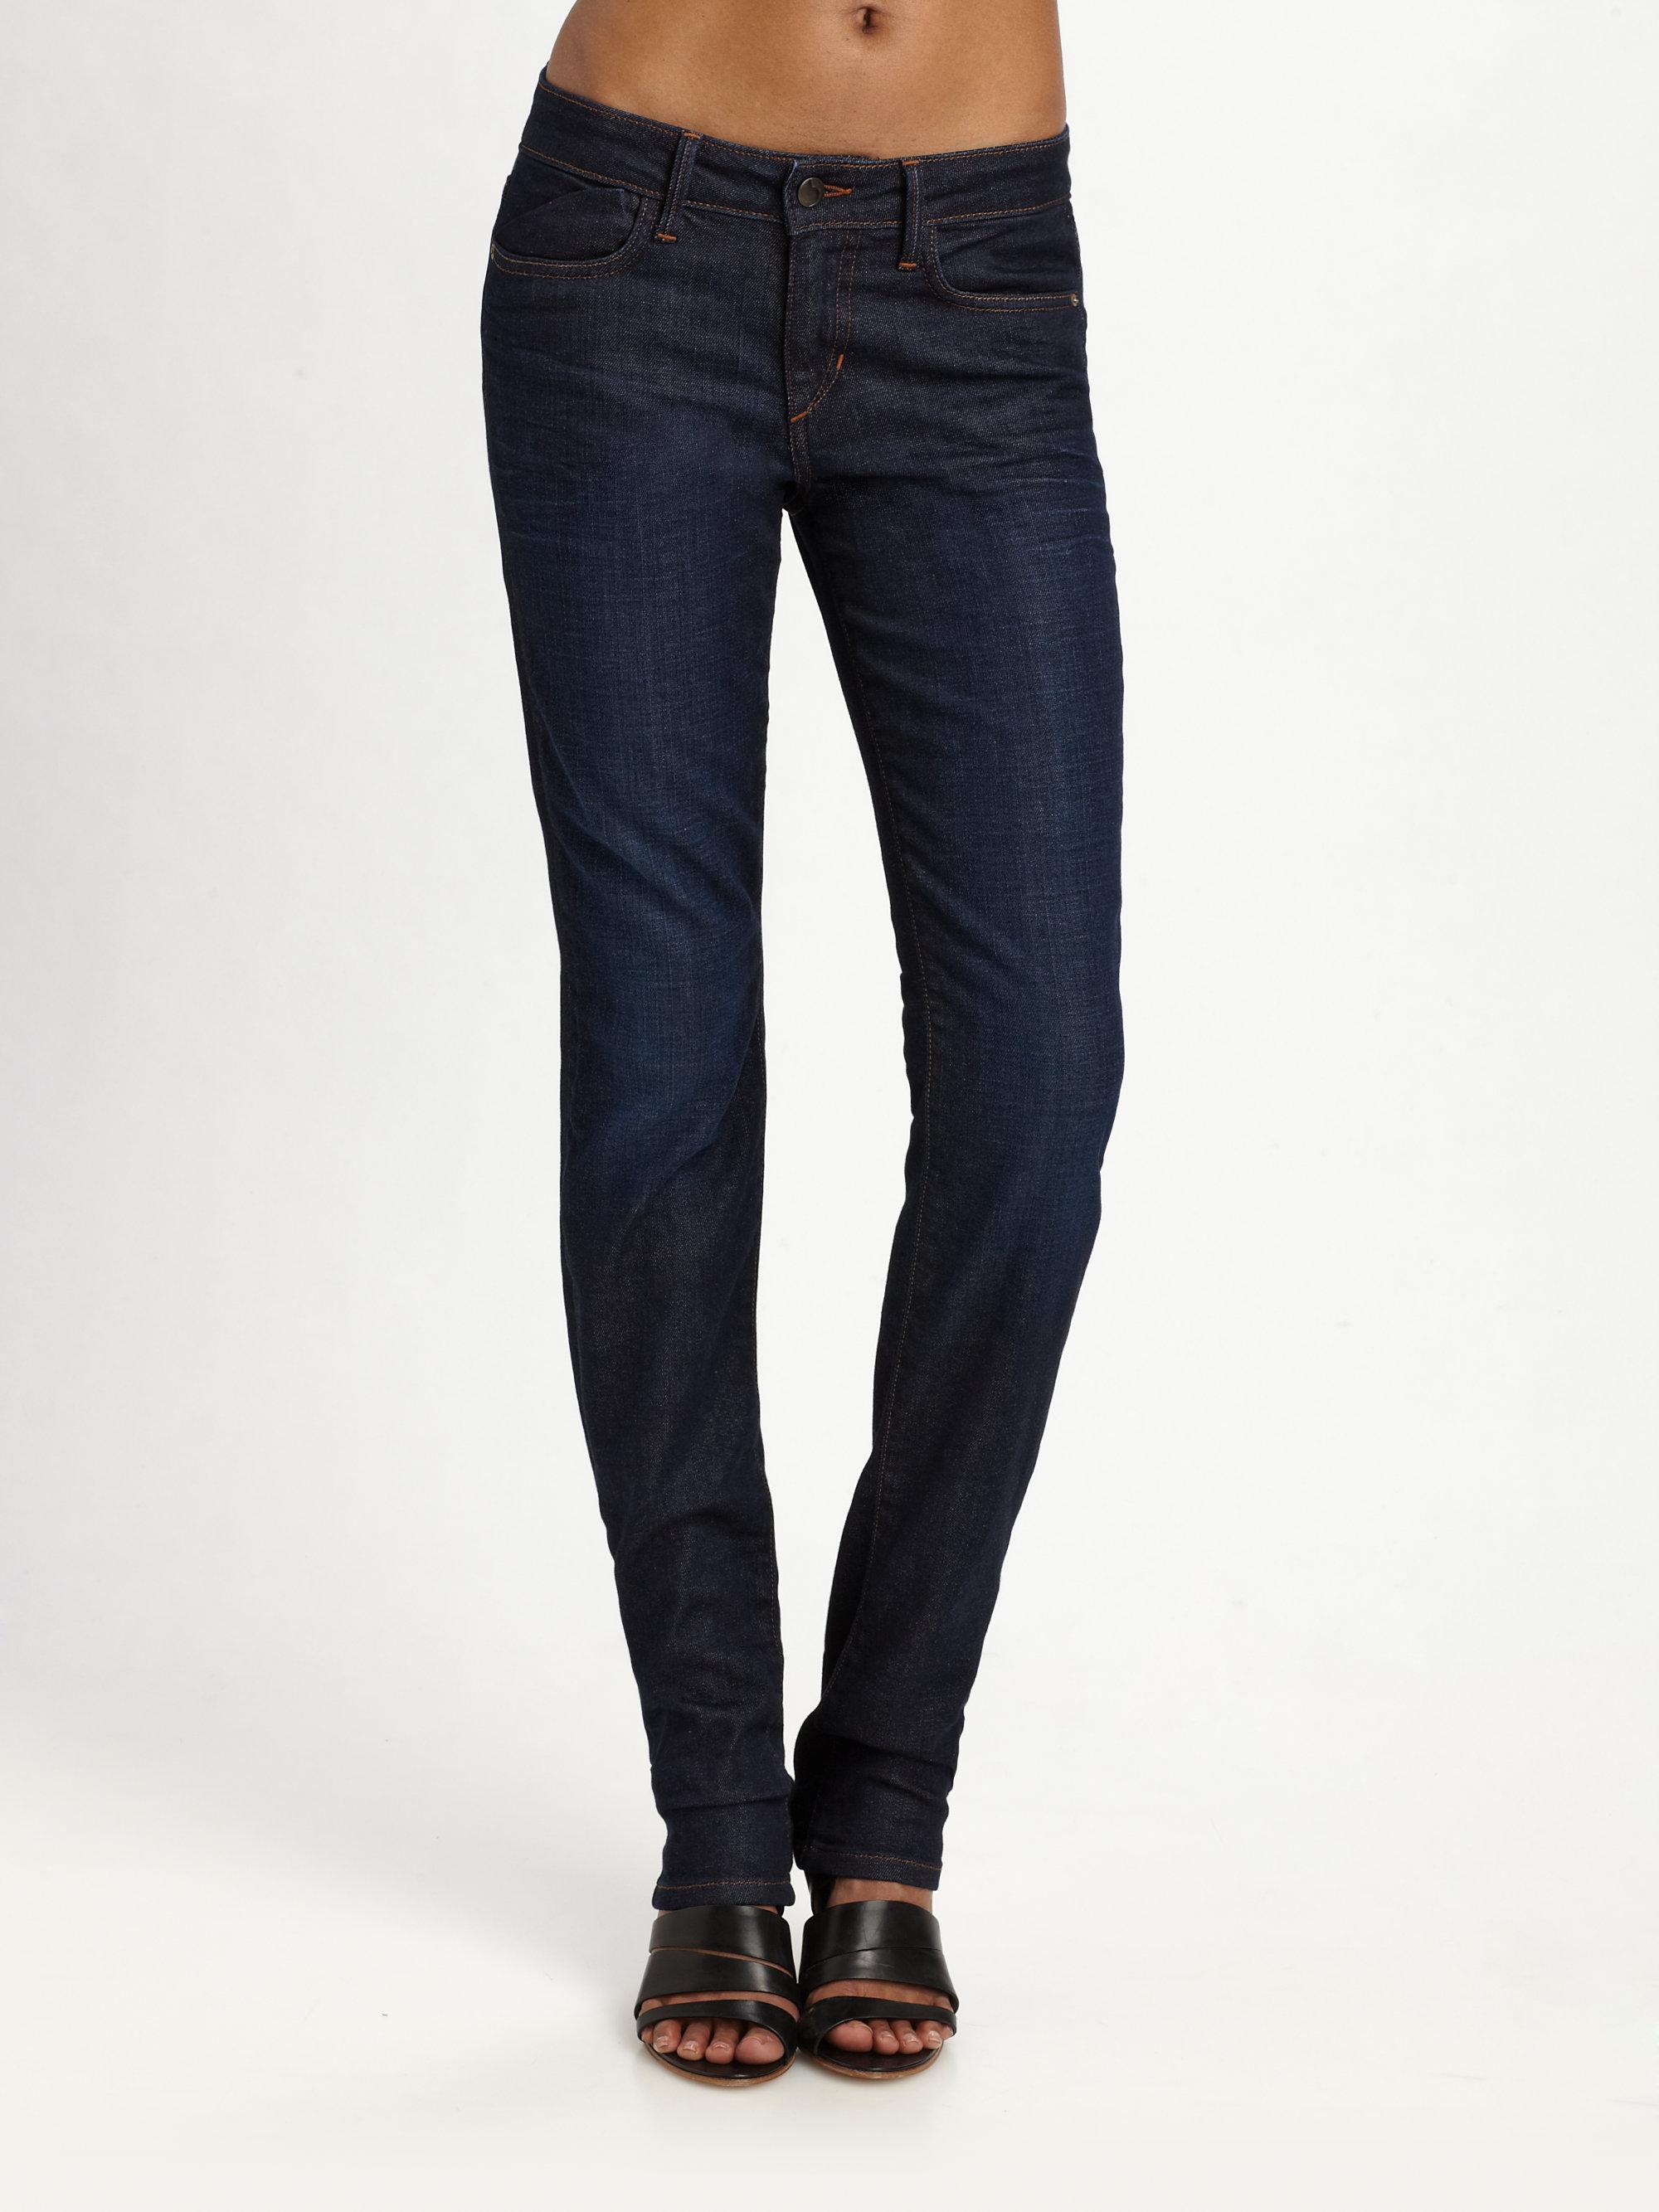 Joe S Jeans Visionaire Skinny Jeans In Blue Lyst